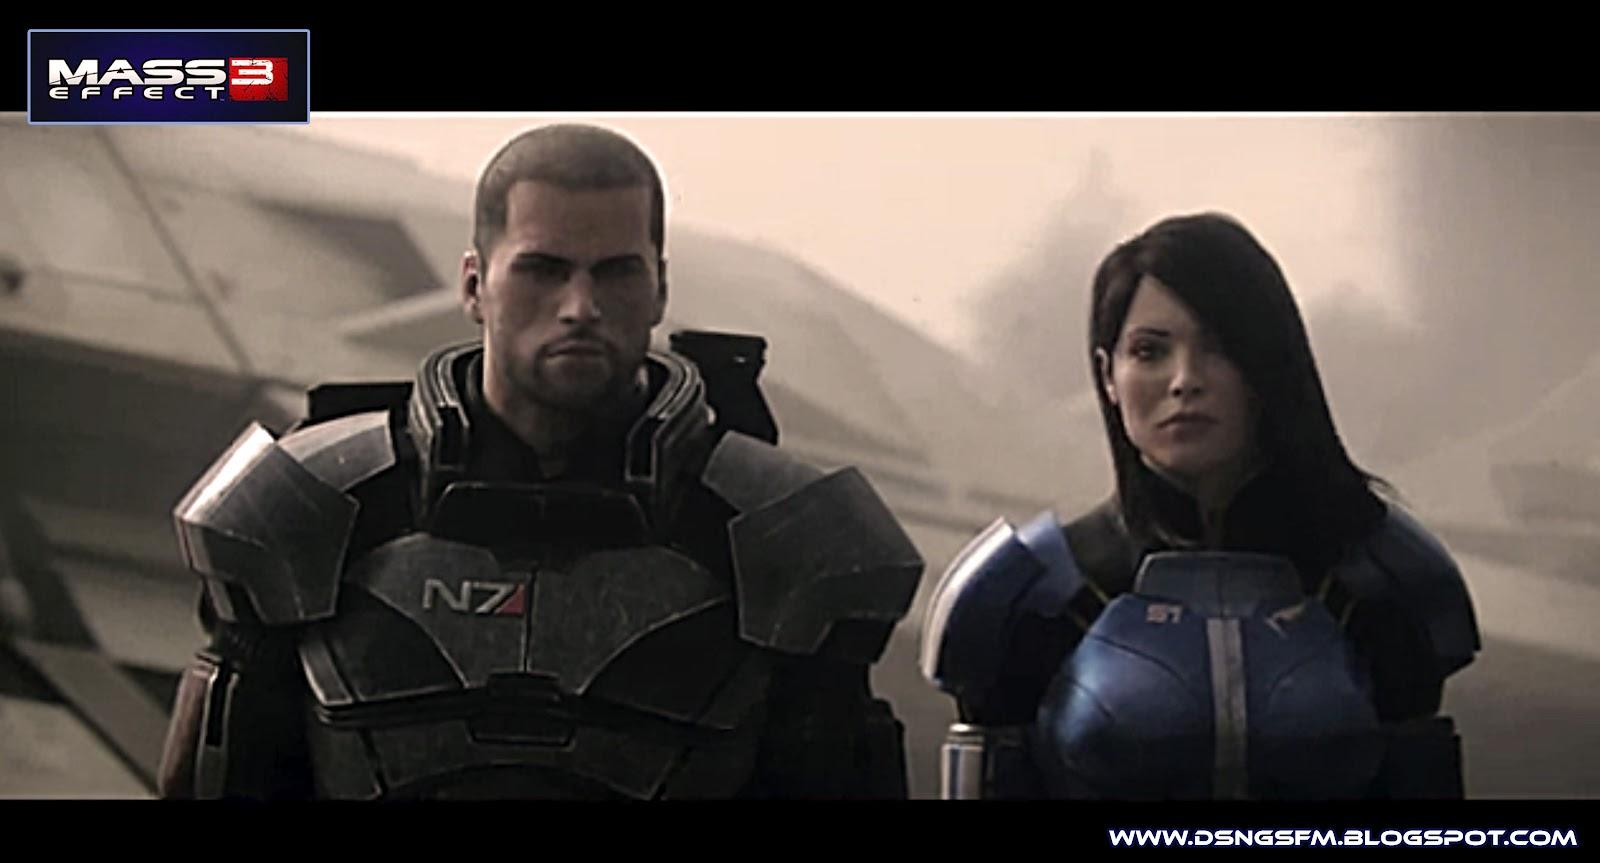 http://4.bp.blogspot.com/-7_FXCtoSlQk/T0sgFMWjmeI/AAAAAAAAD4k/lWP3pzeFpQI/s1600/MASS+EFFECT+3+WALLPAPERS+commander+shephard+diana+miranda+hi+tech+concept+armor+futuristic+normandy+spaceship+cruiser+armada+hyper+space++n7+alliance+1.jpg